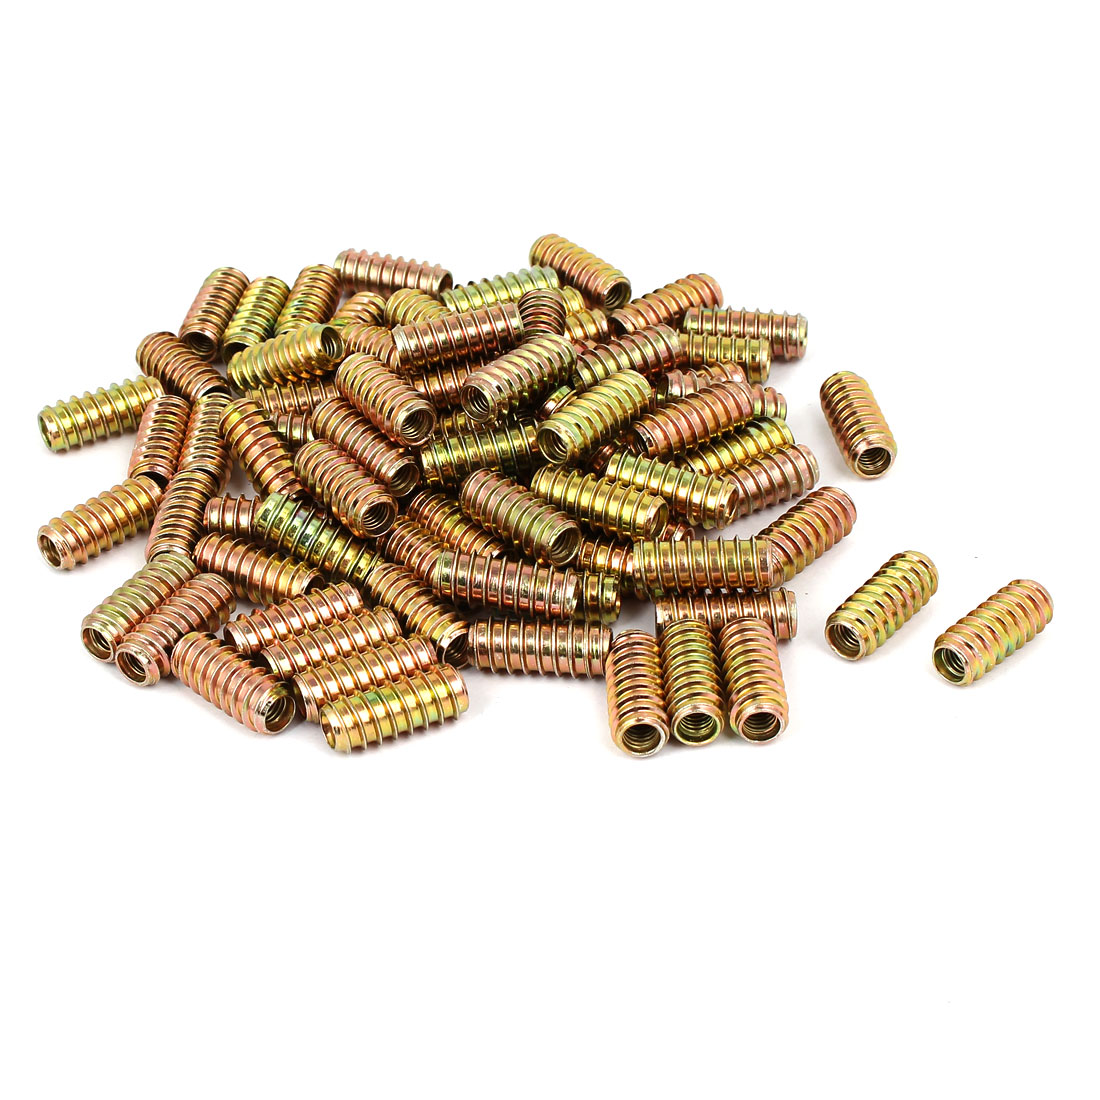 6mm x 25mm Yellow Zinc Plated E-Nut Wood Furniture Insert Nut 100PCS